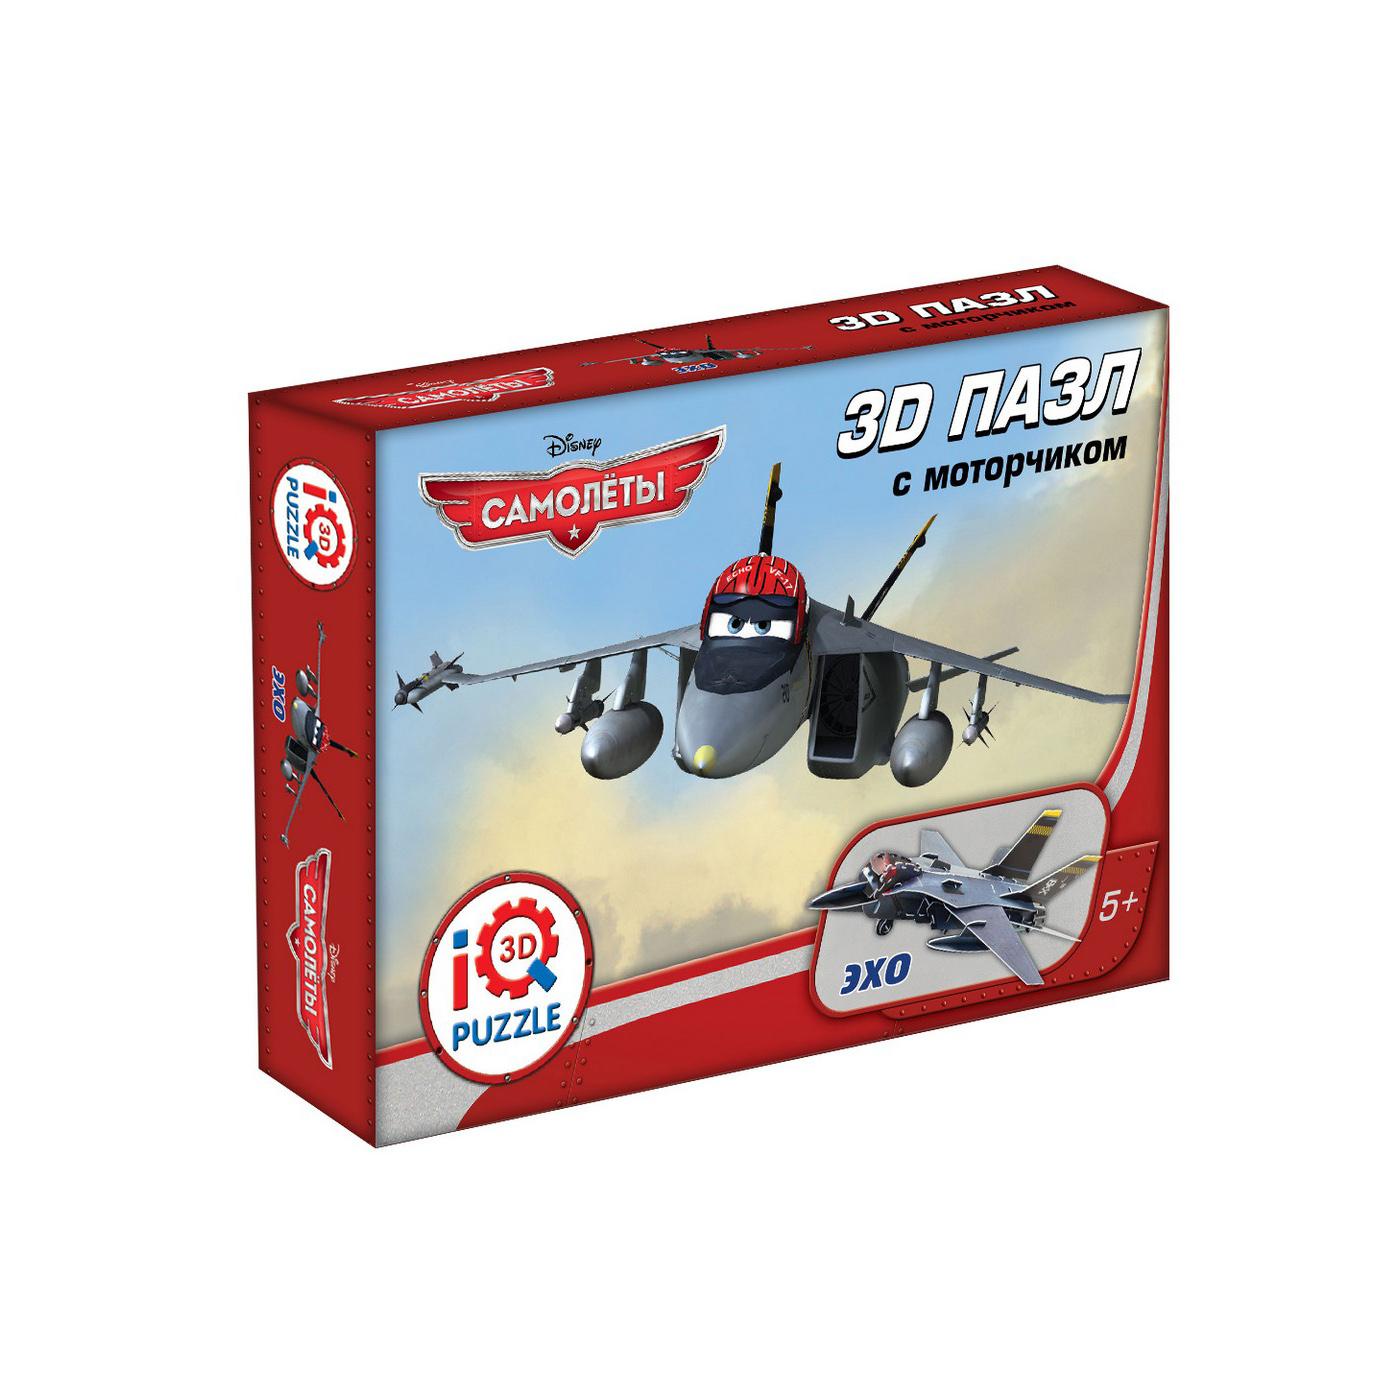 3D пазл Disney Самолеты - Эхо, инерционныйПазлы объёмные 3D<br>3D пазл Disney Самолеты - Эхо, инерционный<br>